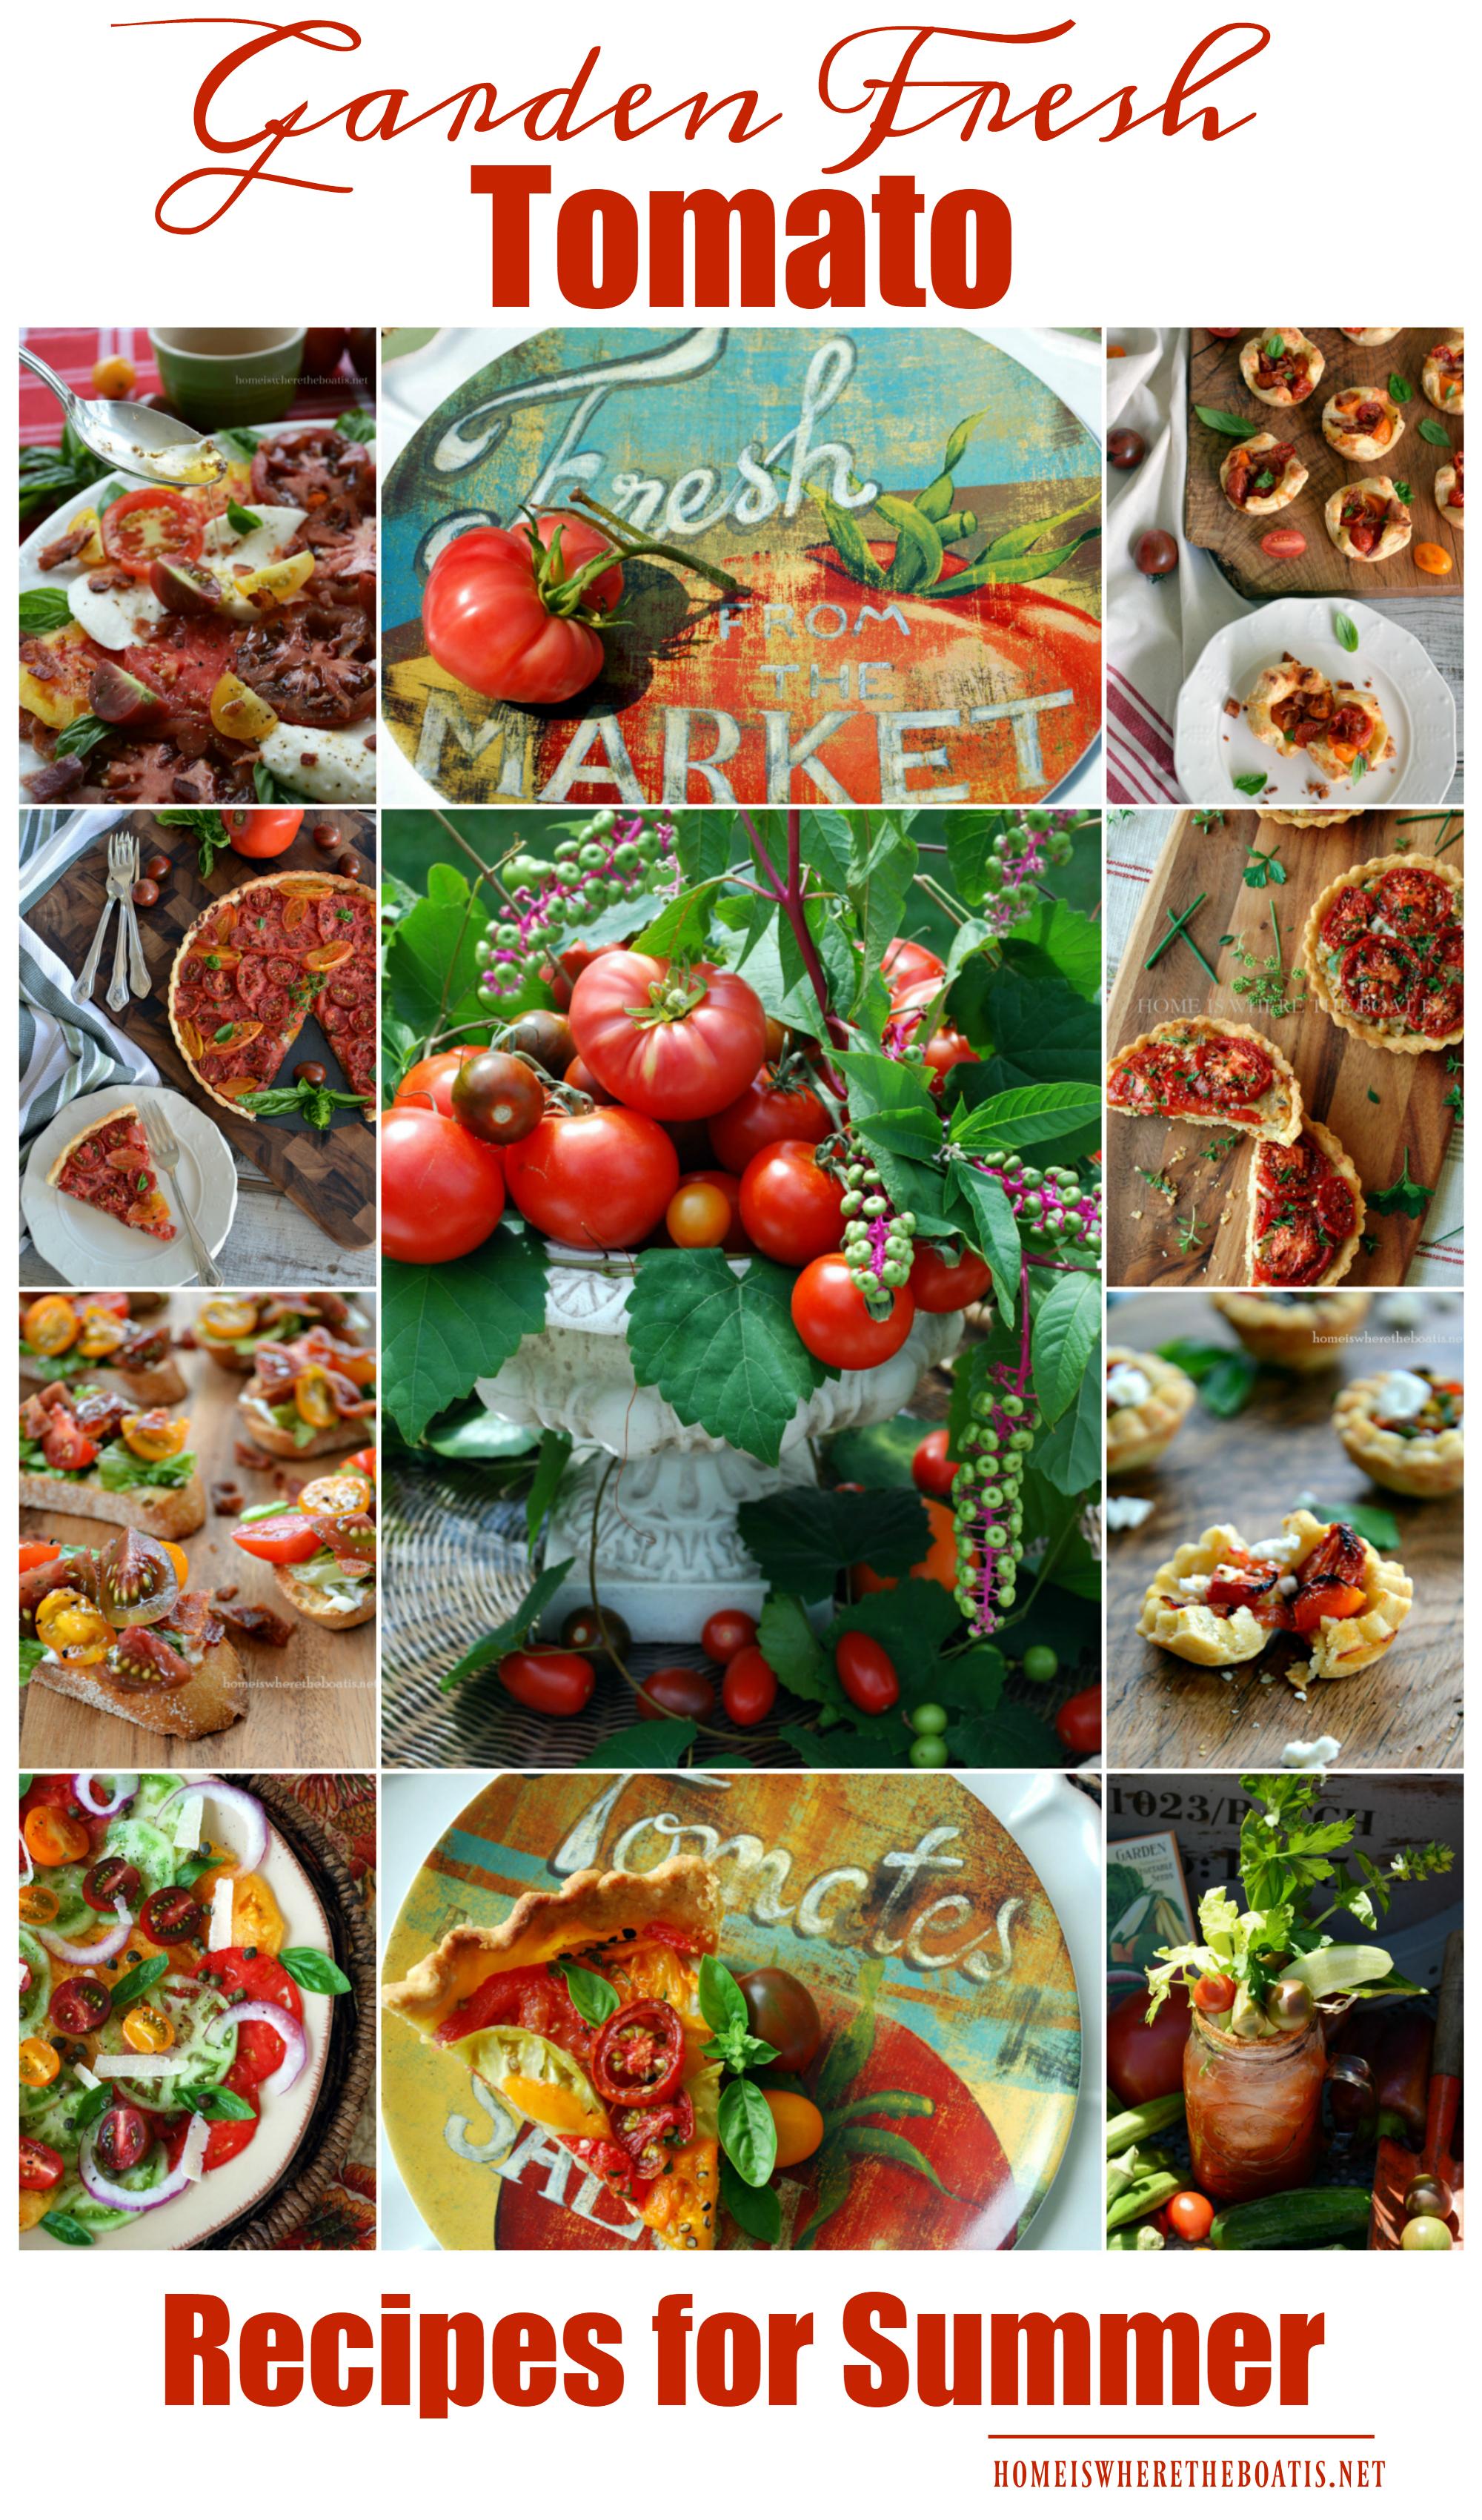 Garden Fresh Tomato Recipes for Summer